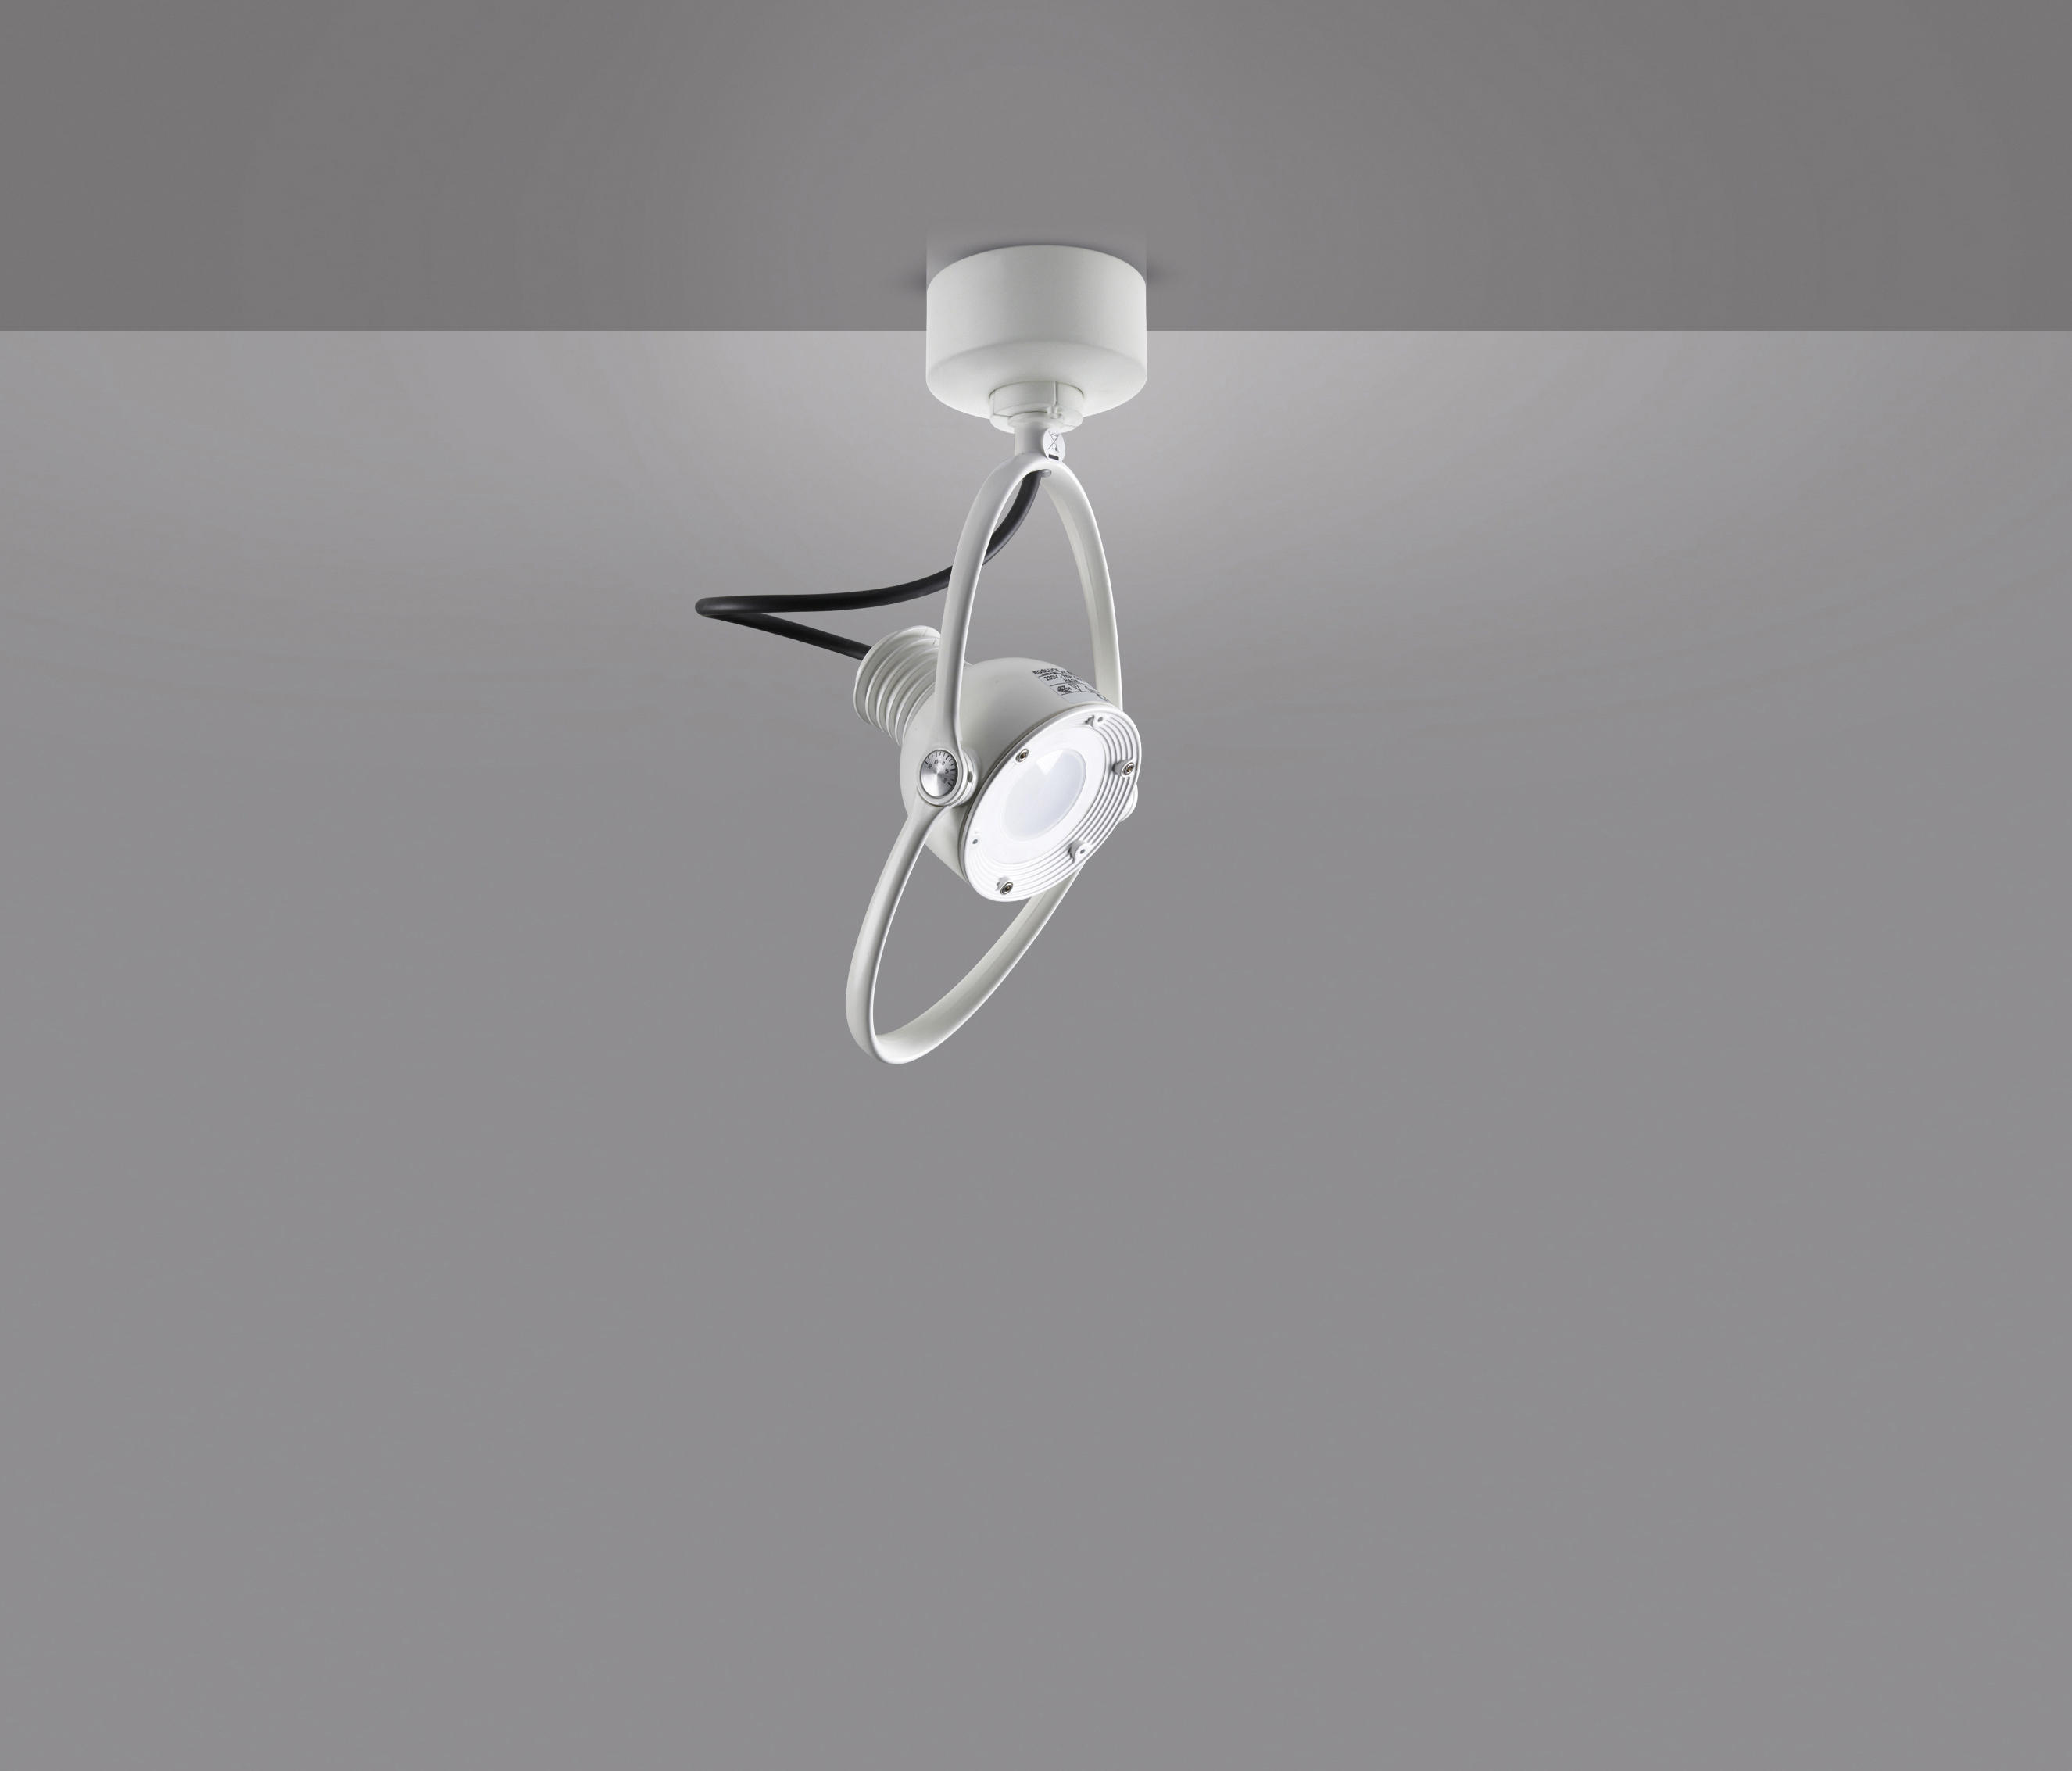 Colibri small led ceiling lights from egoluce architonic colibri small led by egoluce ceiling lights aloadofball Choice Image